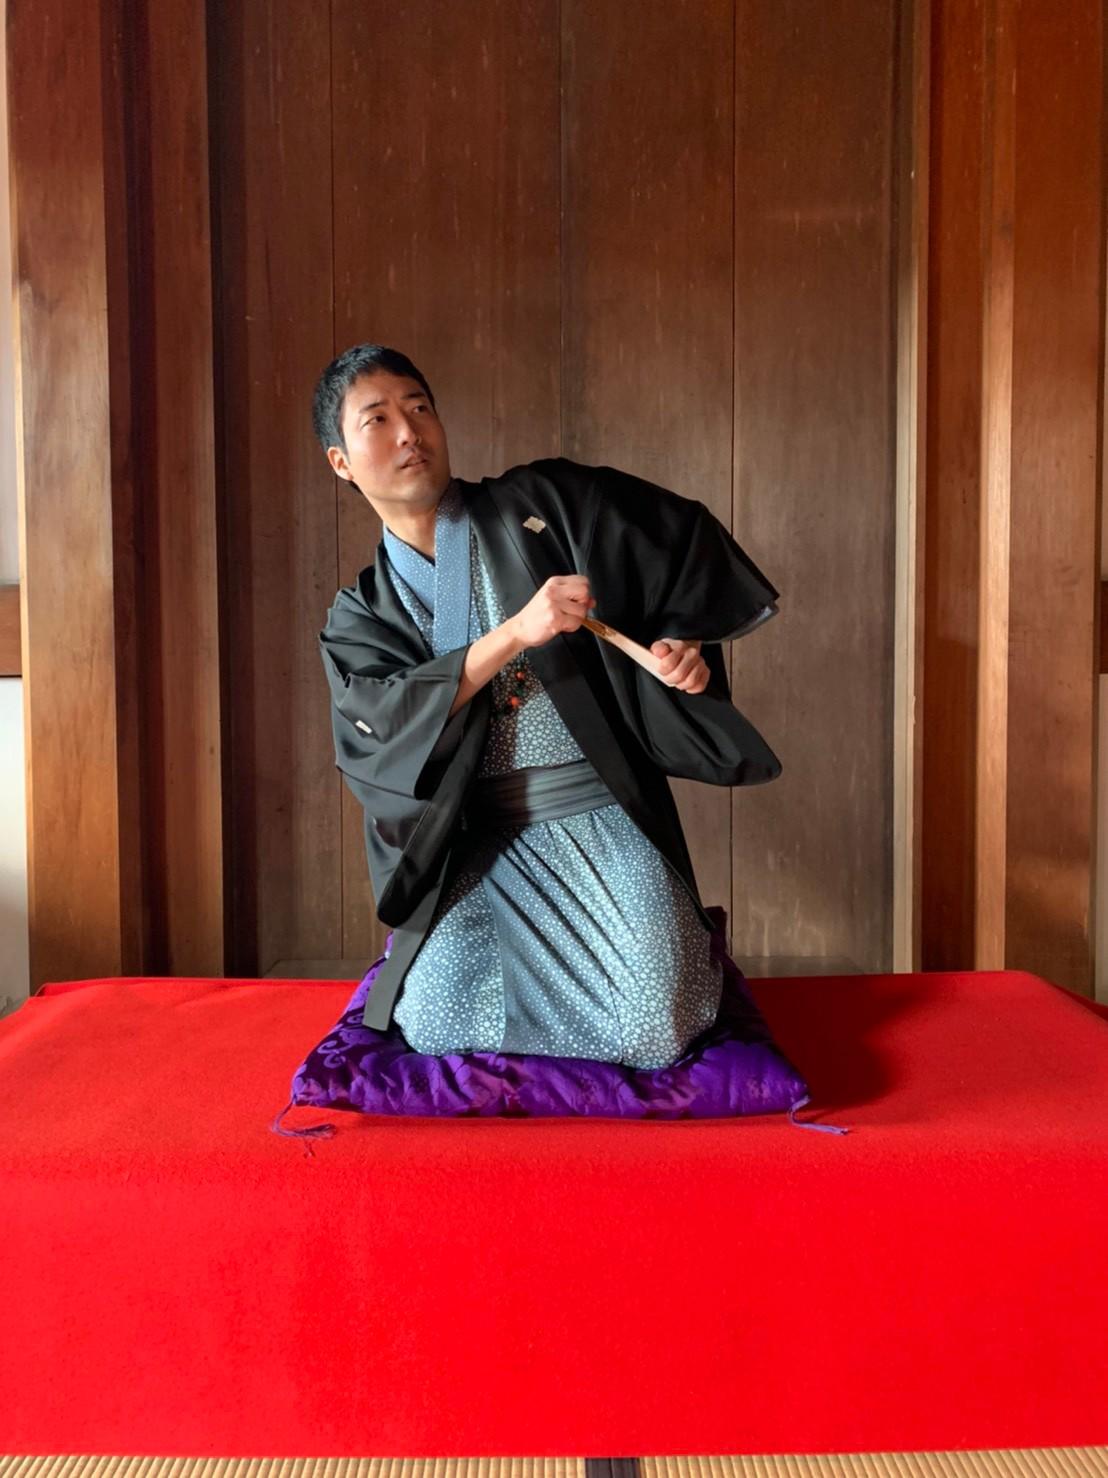 20201220伝統芸能で旅する京都 落語 三十石 桂紋四郎